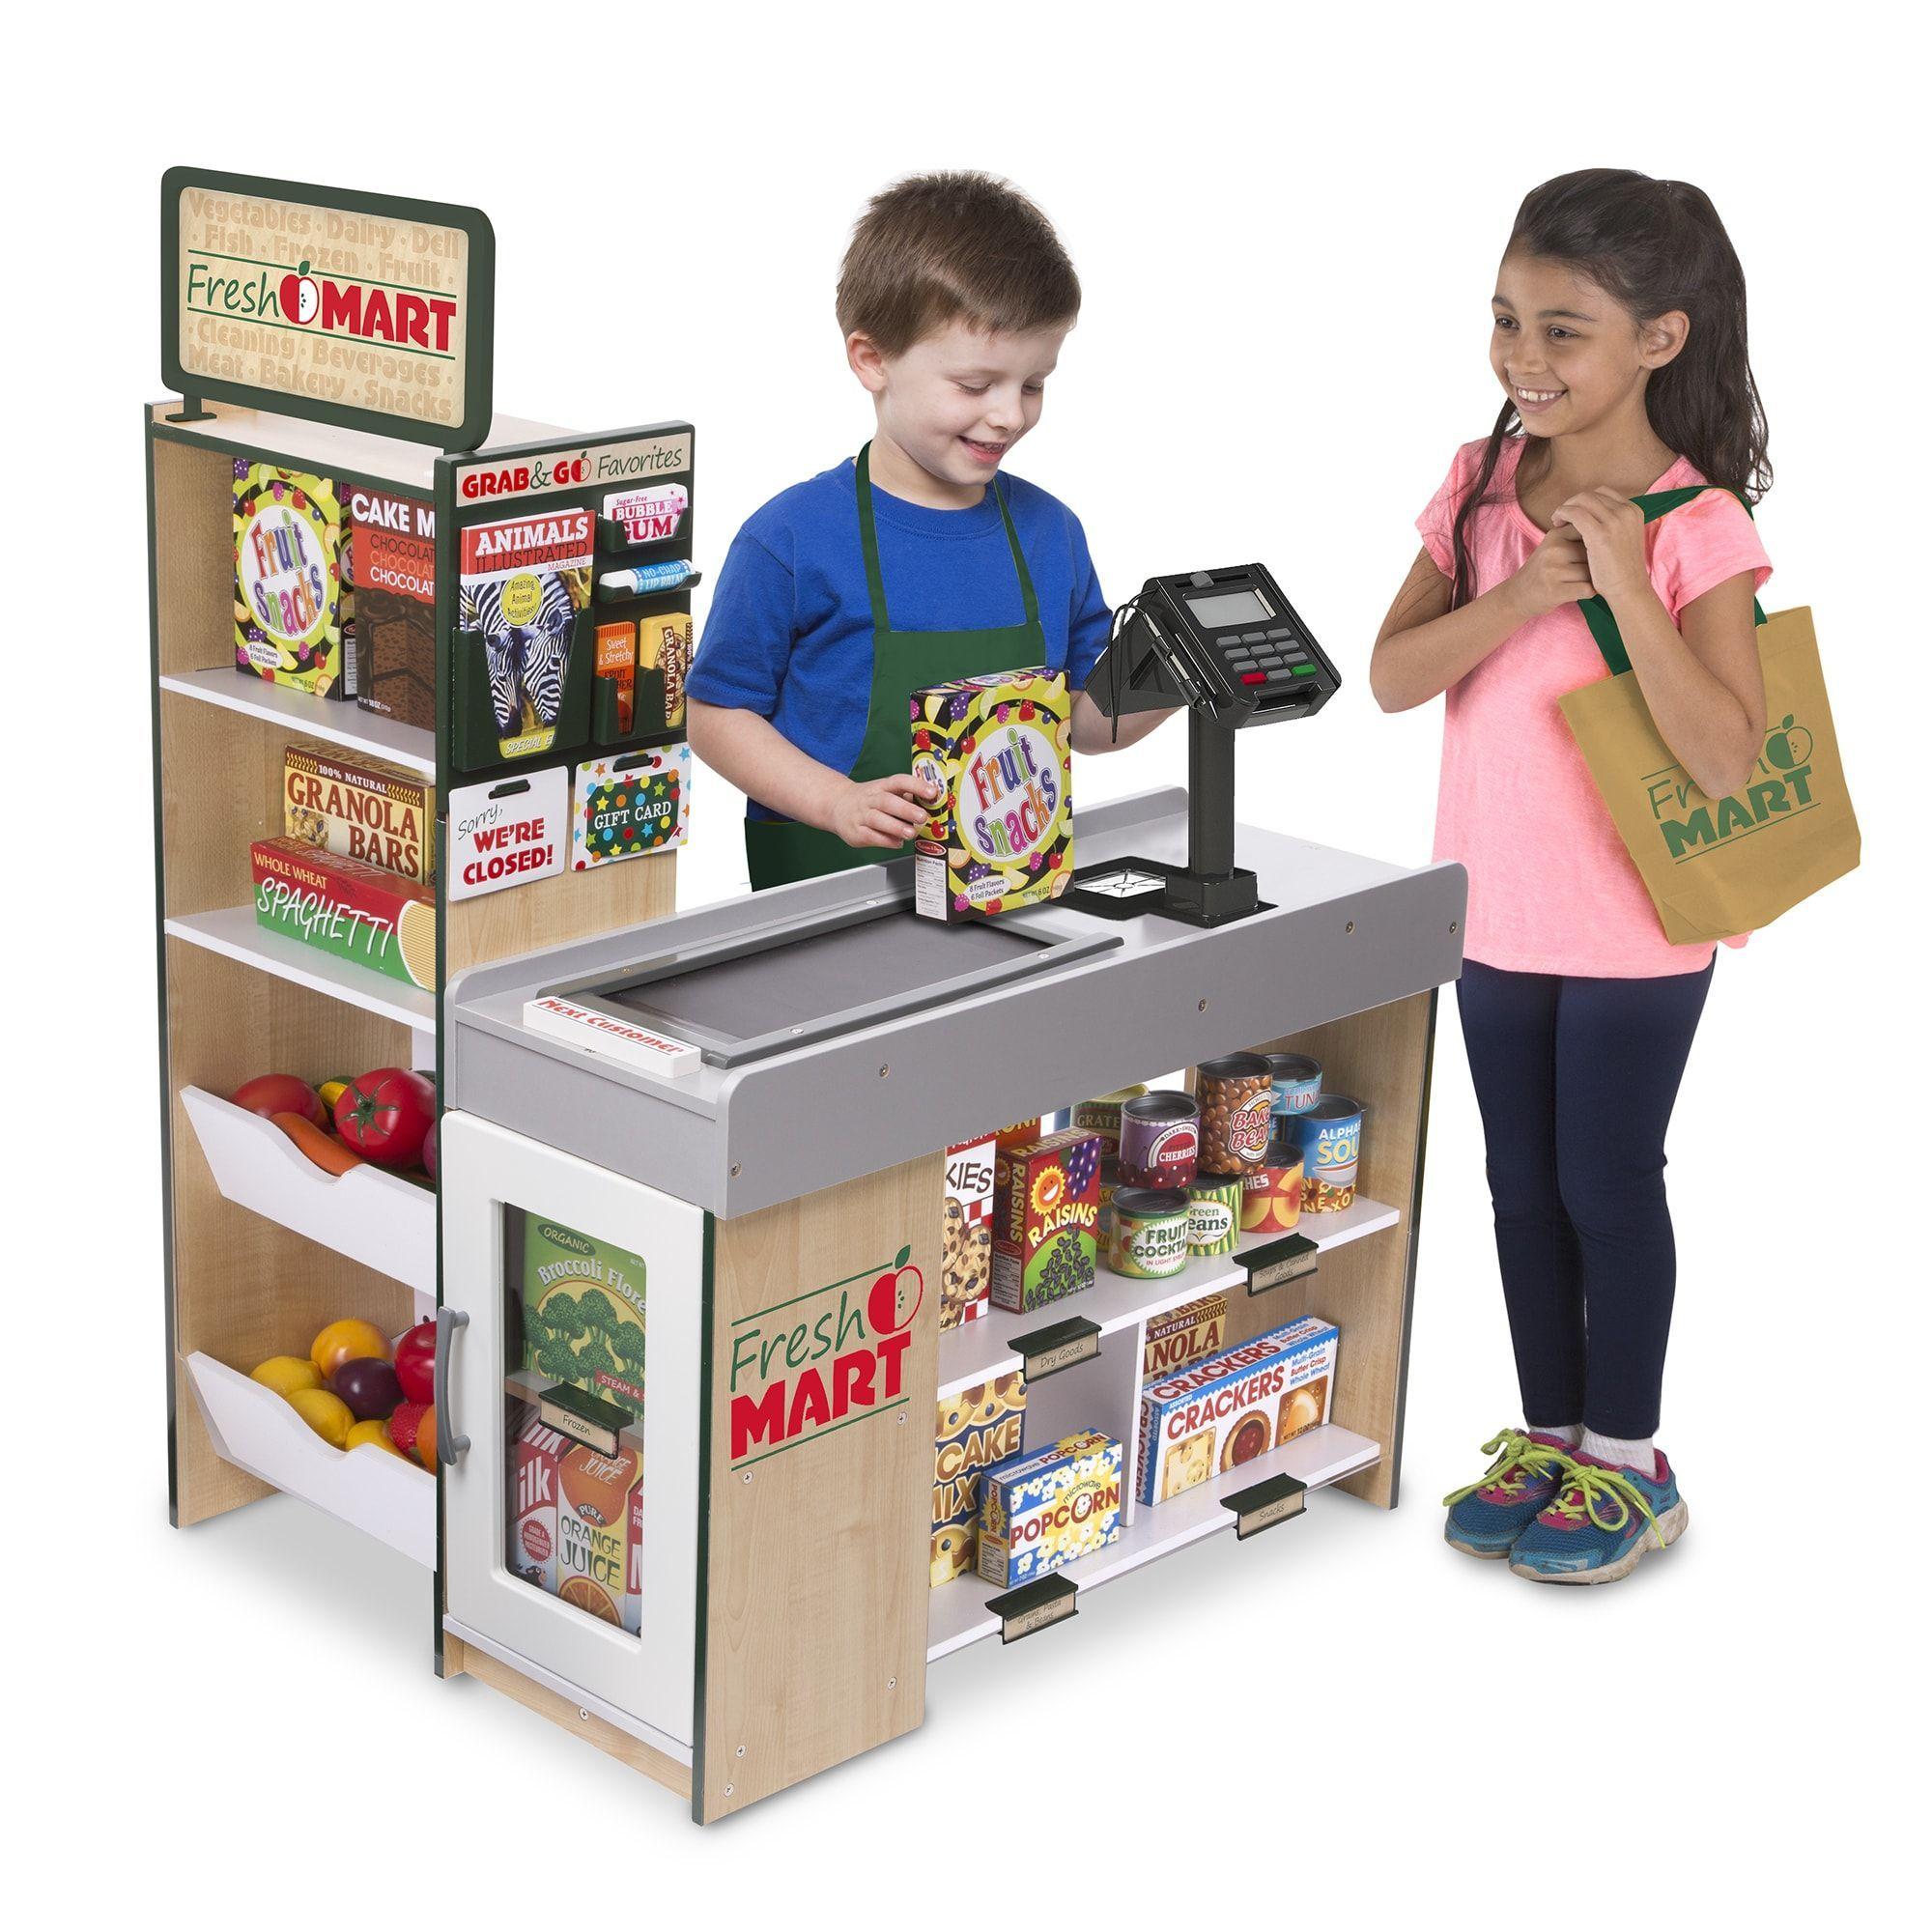 Melissa doug freestanding wooden fresh mart grocery